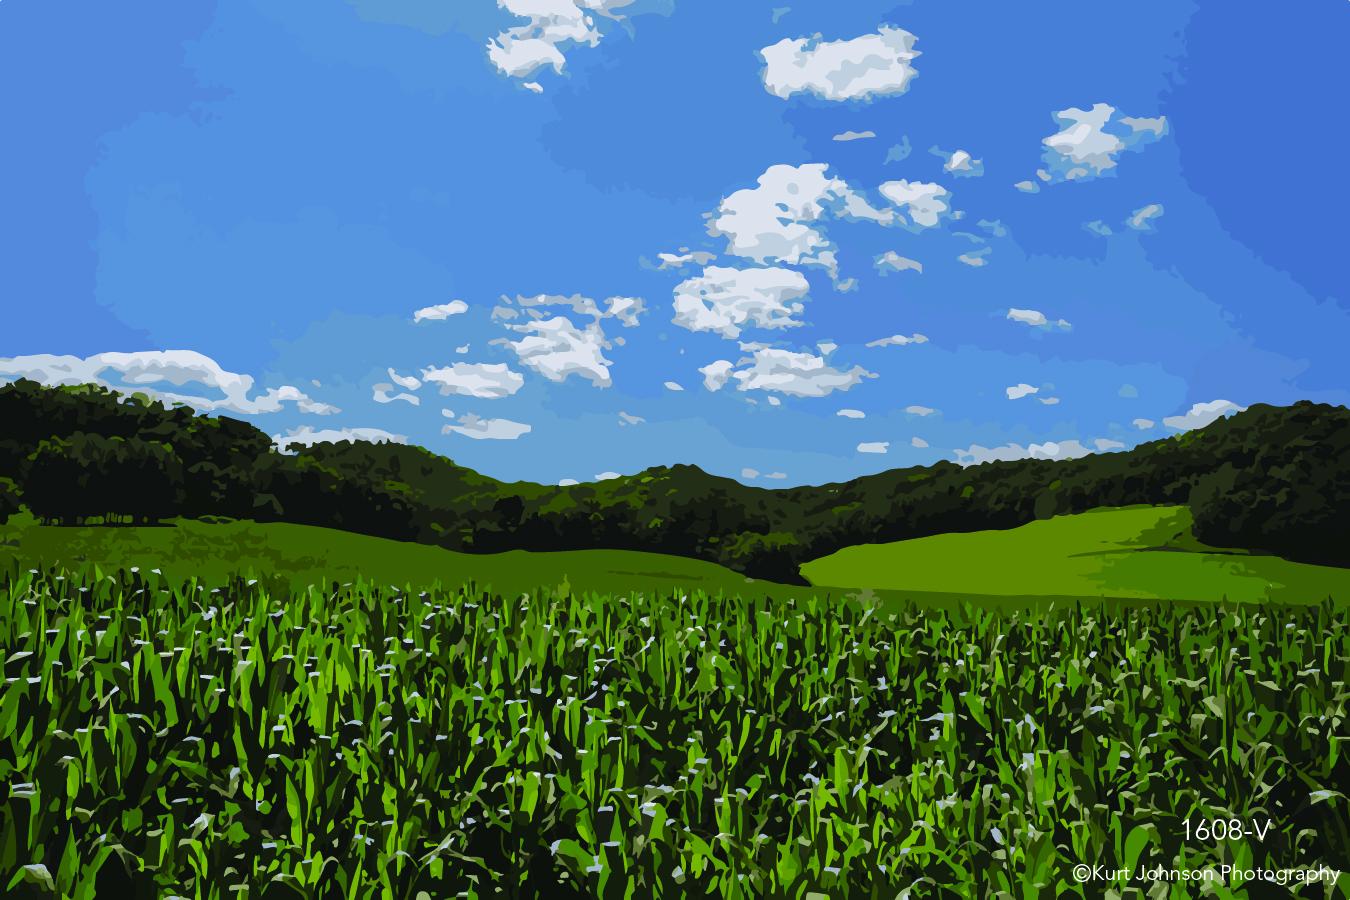 landscape corn field midwest blue sky clouds vector green grass